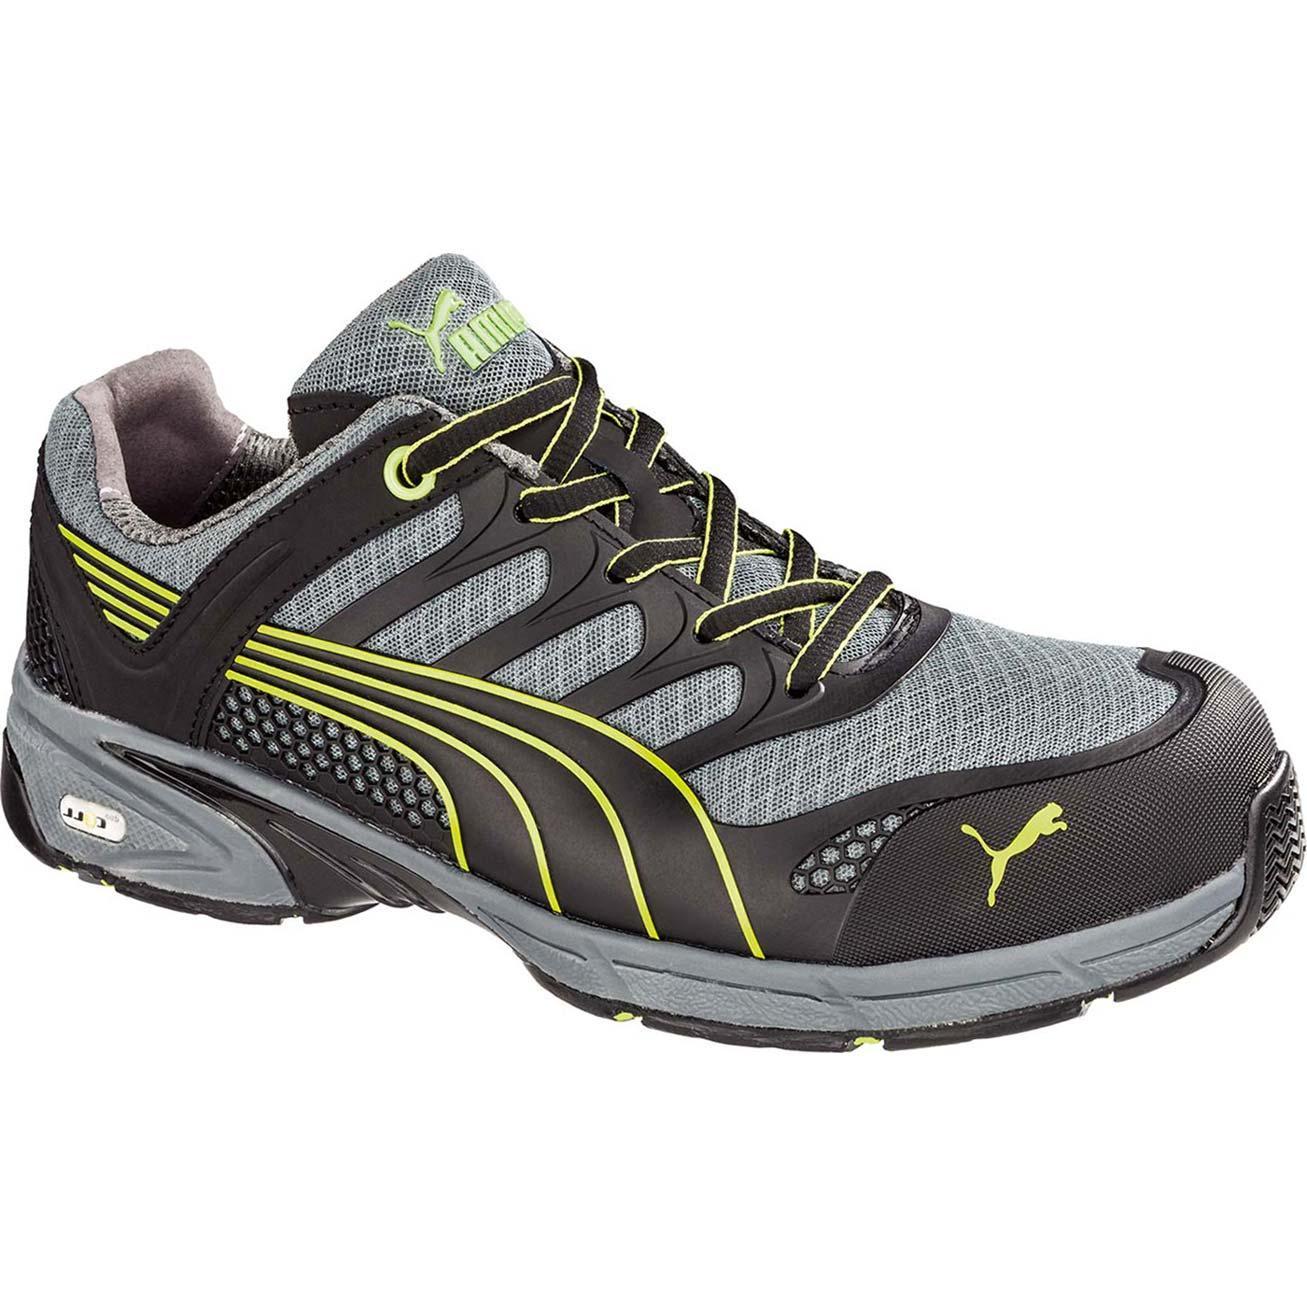 14430b5ee56e28 Puma Fuse Motion Green Composite Toe Static-Dissipative Shoe